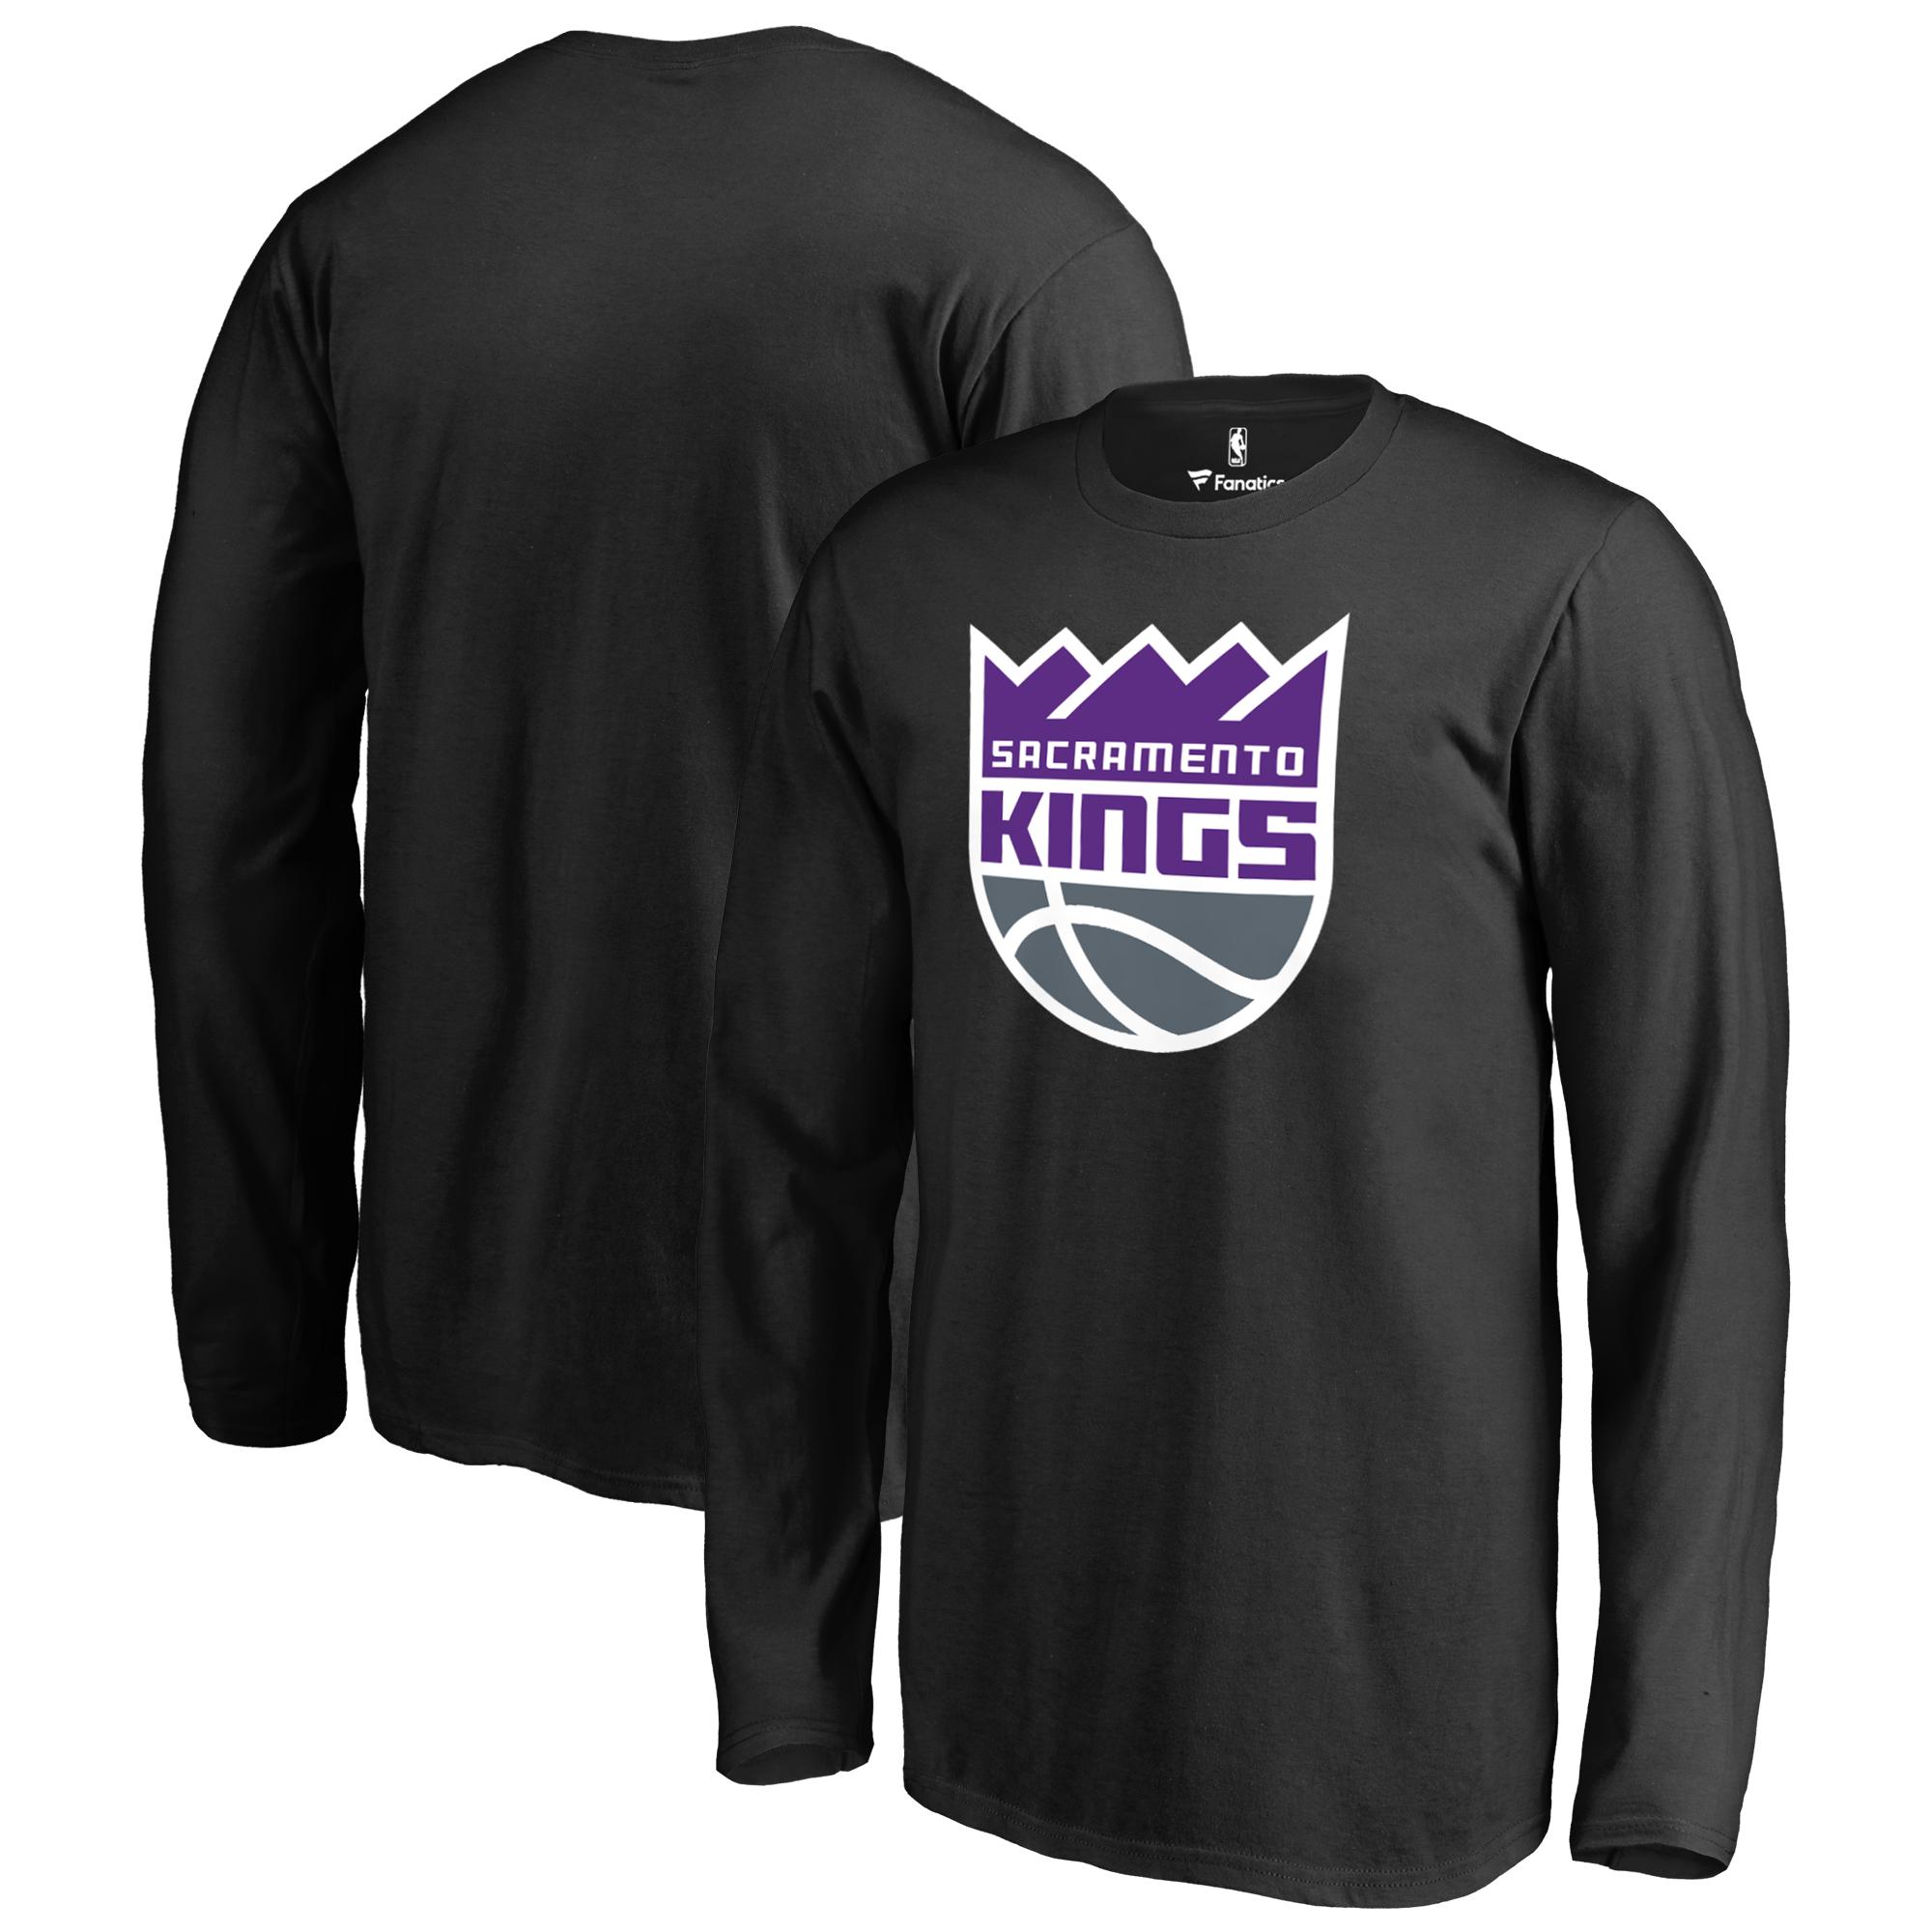 Sacramento Kings Fanatics Branded Youth Primary Logo Long Sleeve T-Shirt - Black